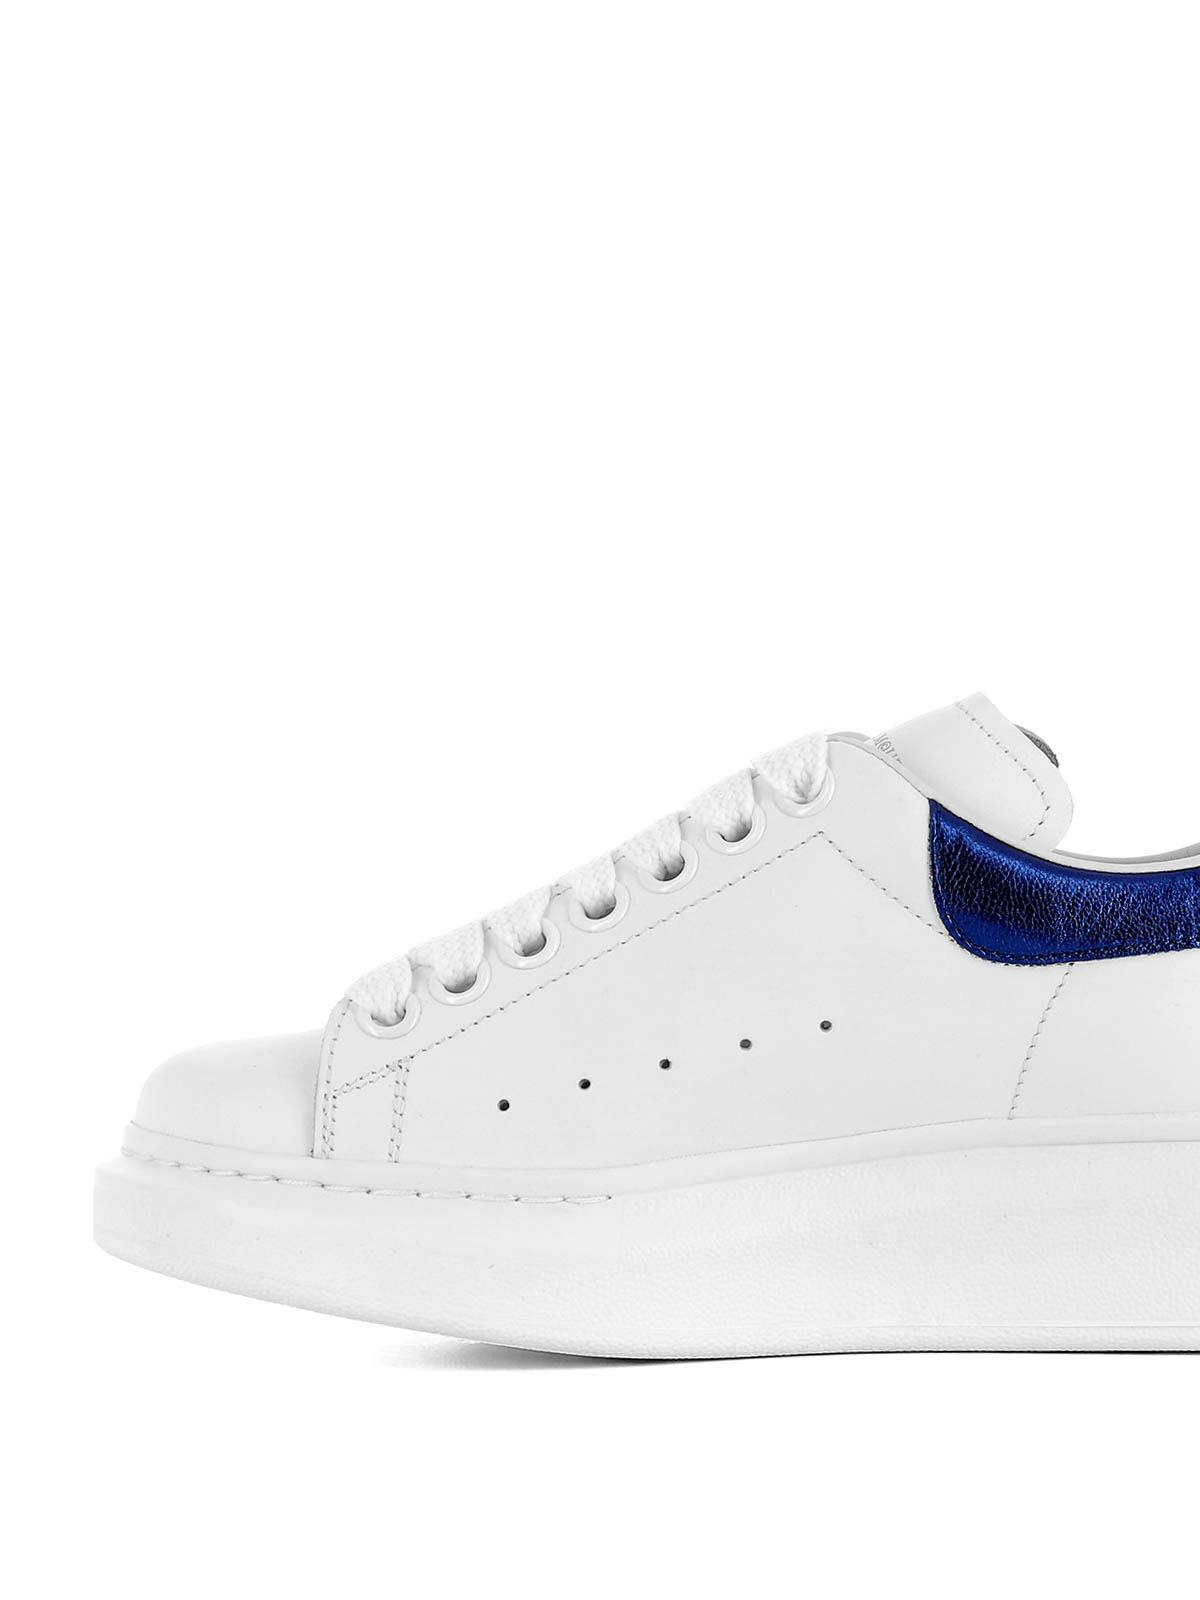 Alexander Mcqueen - Sneaker stringate e inserto blu ...